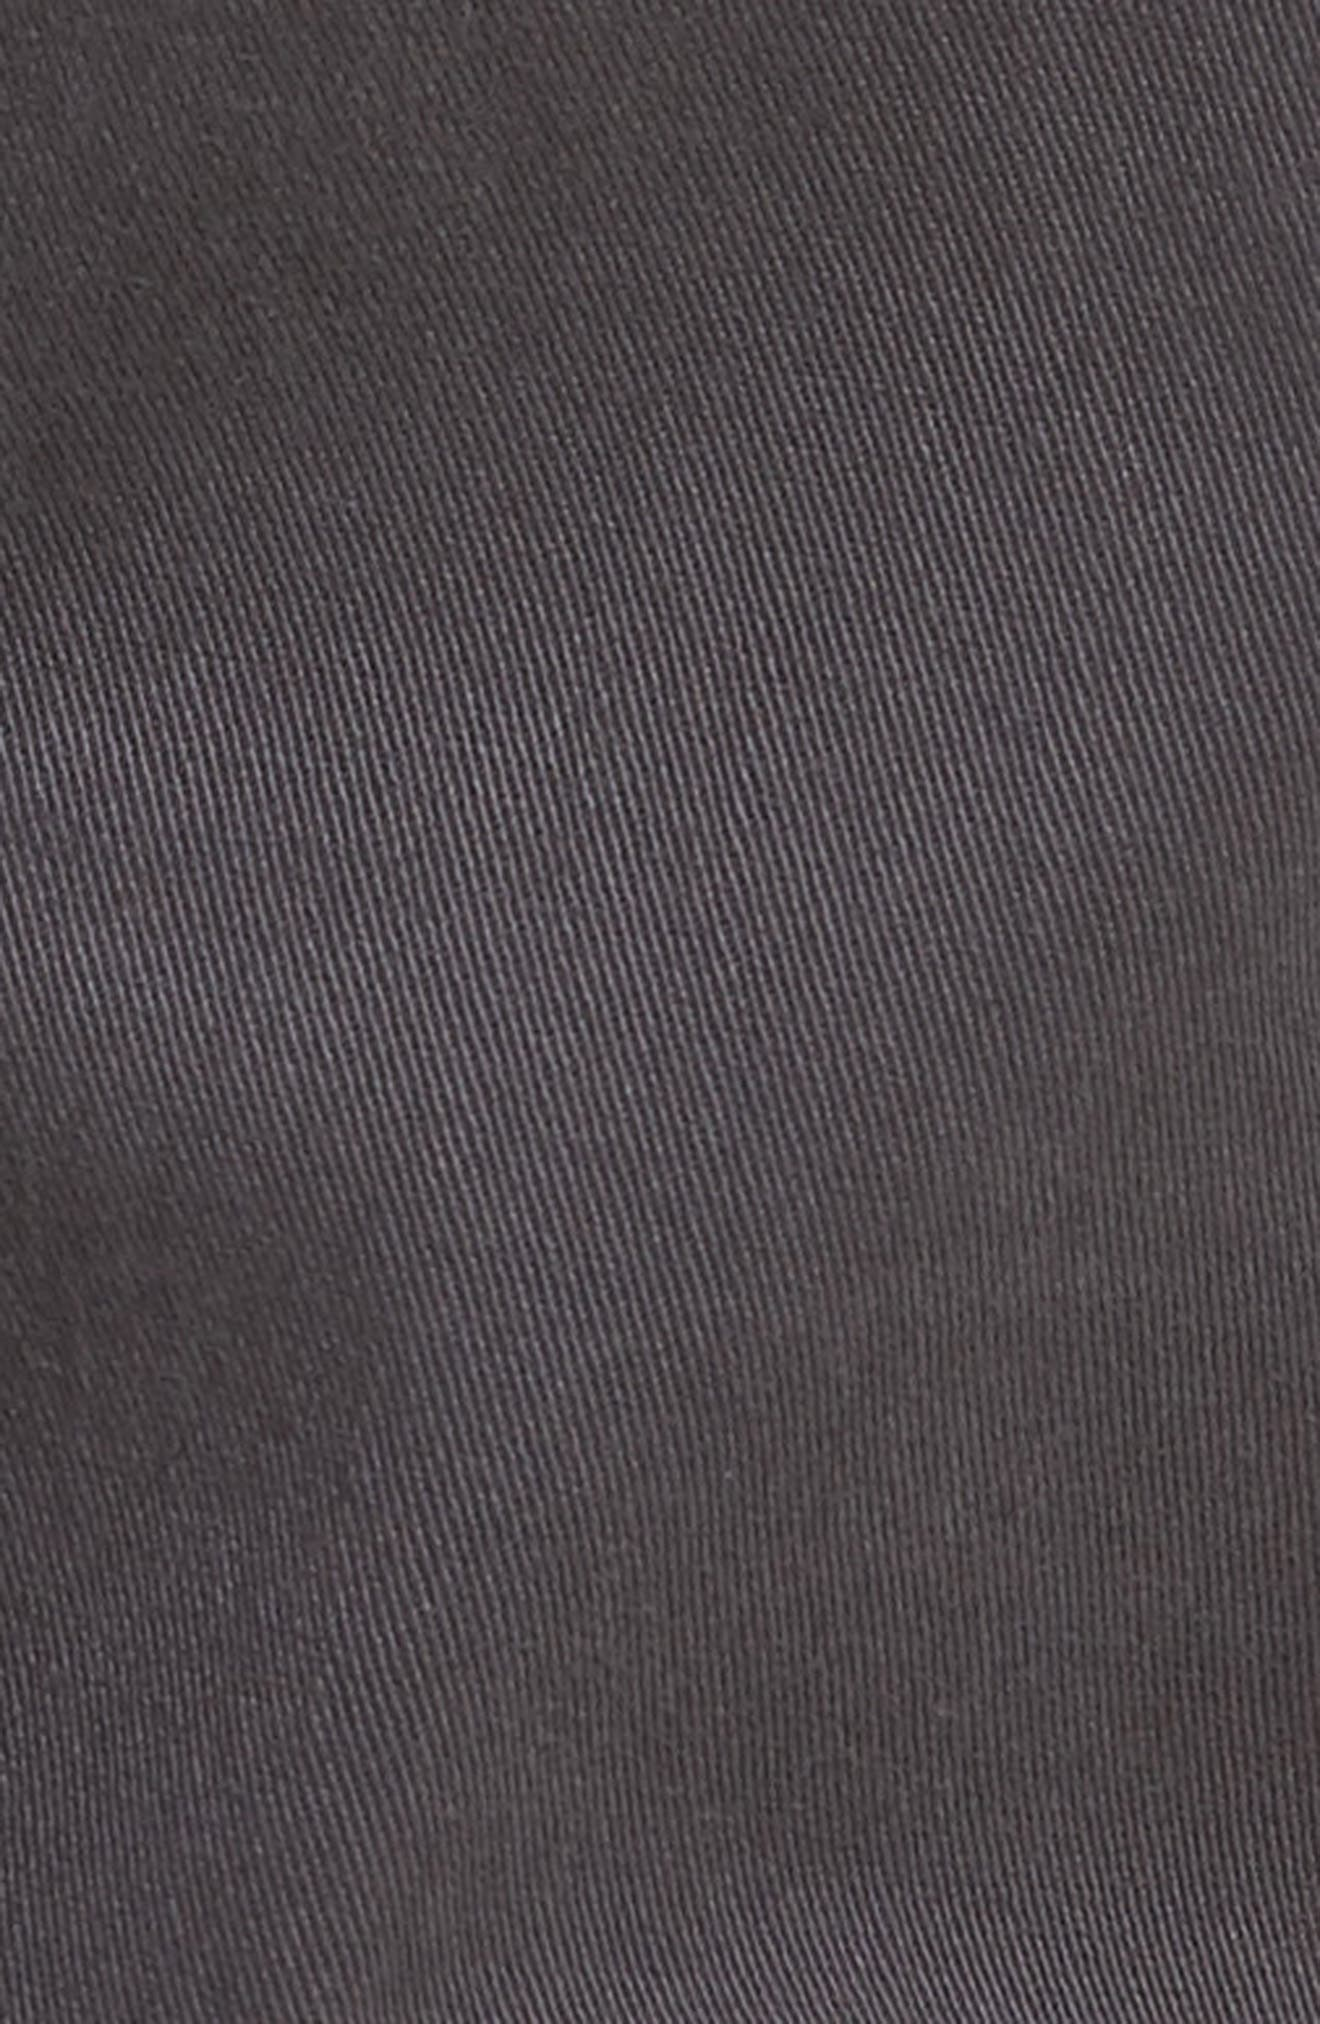 Blake Slim Fit Jeans,                             Alternate thumbnail 5, color,                             Metal